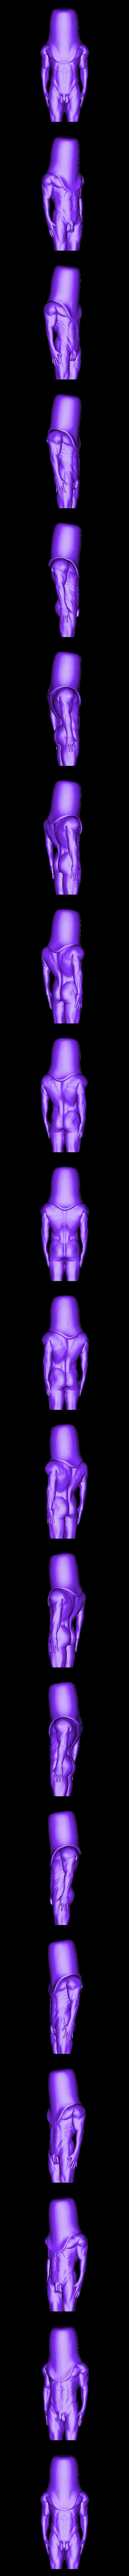 Bulletman.stl Download free STL file MORUGETSOYO (BULLETMEN) for miniature wargame terrain • 3D printer object, louiskim92